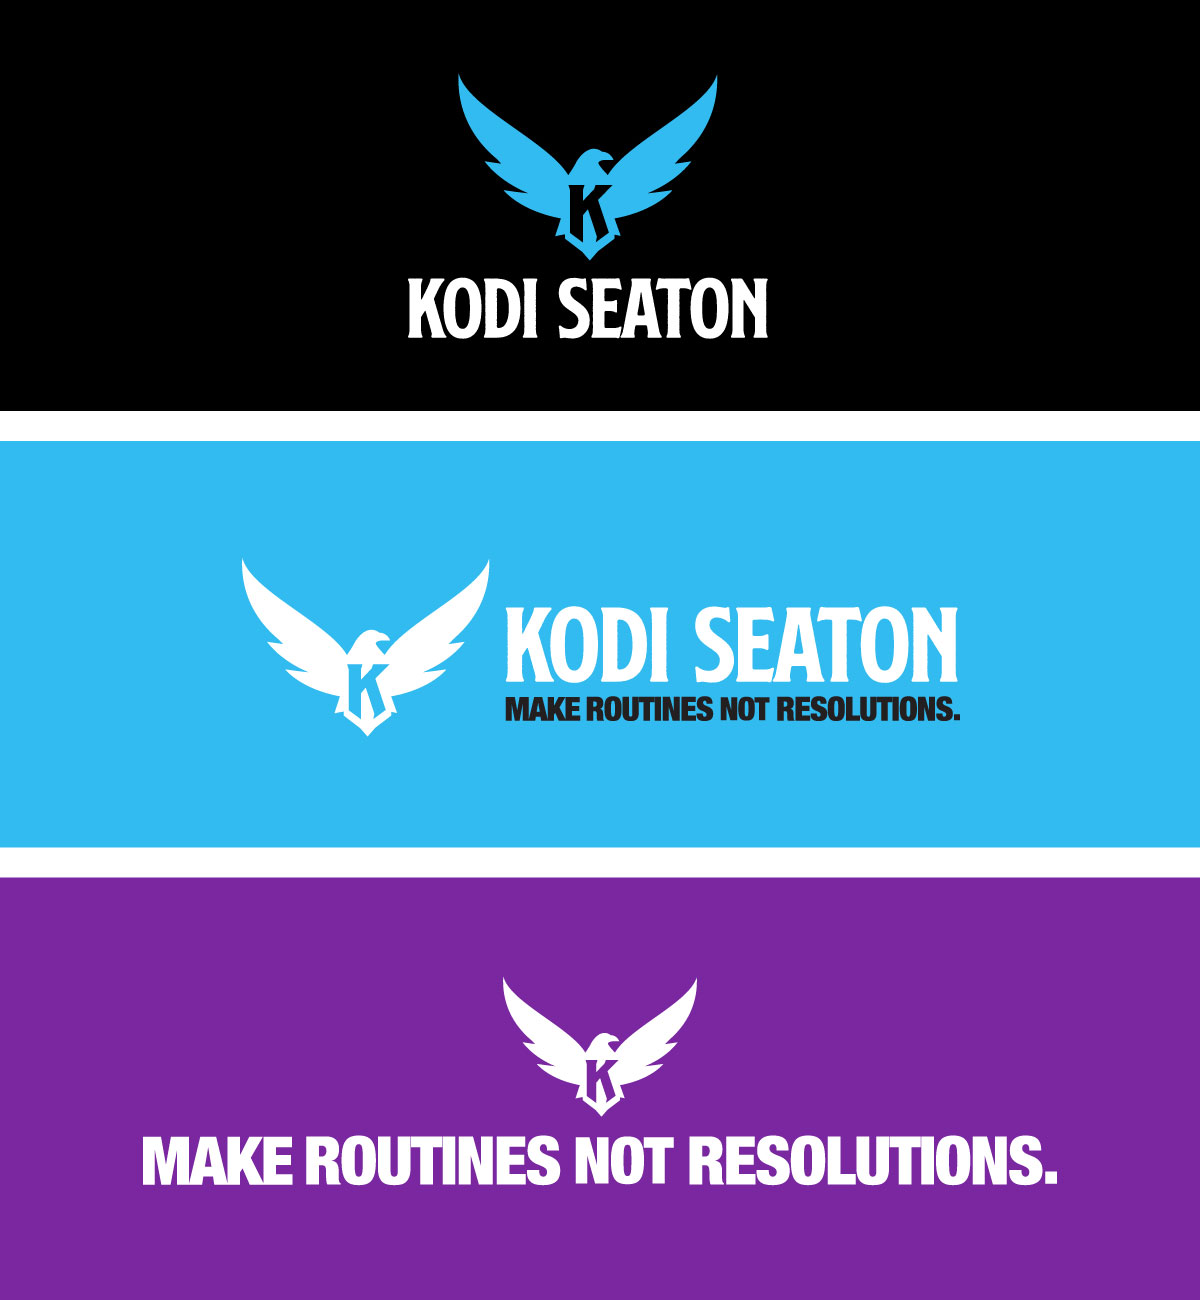 KodiSeaton.com logo